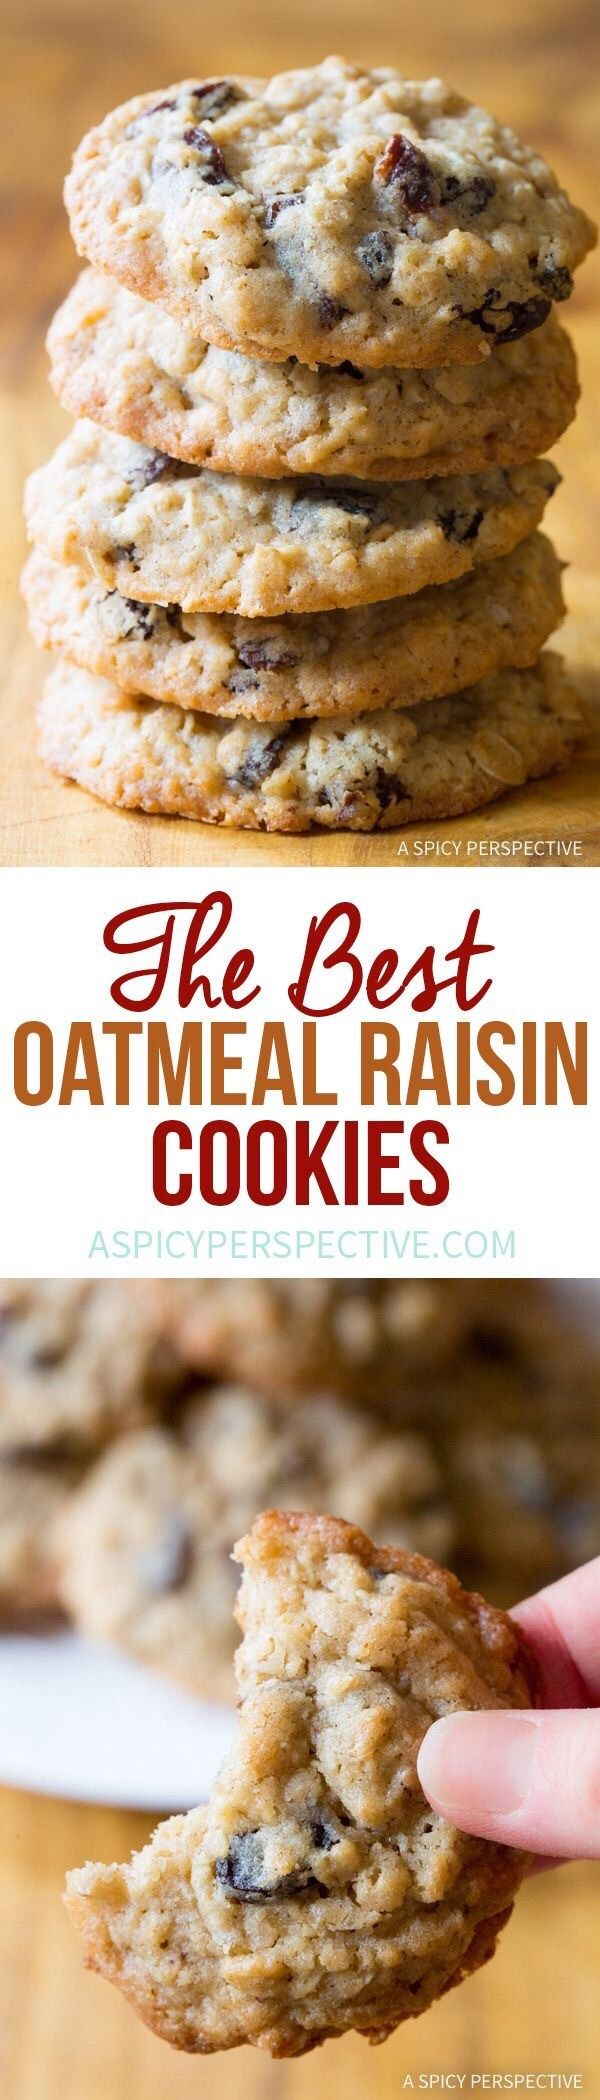 23 Rich & Flavorful Raisin Recipes | Chief Health